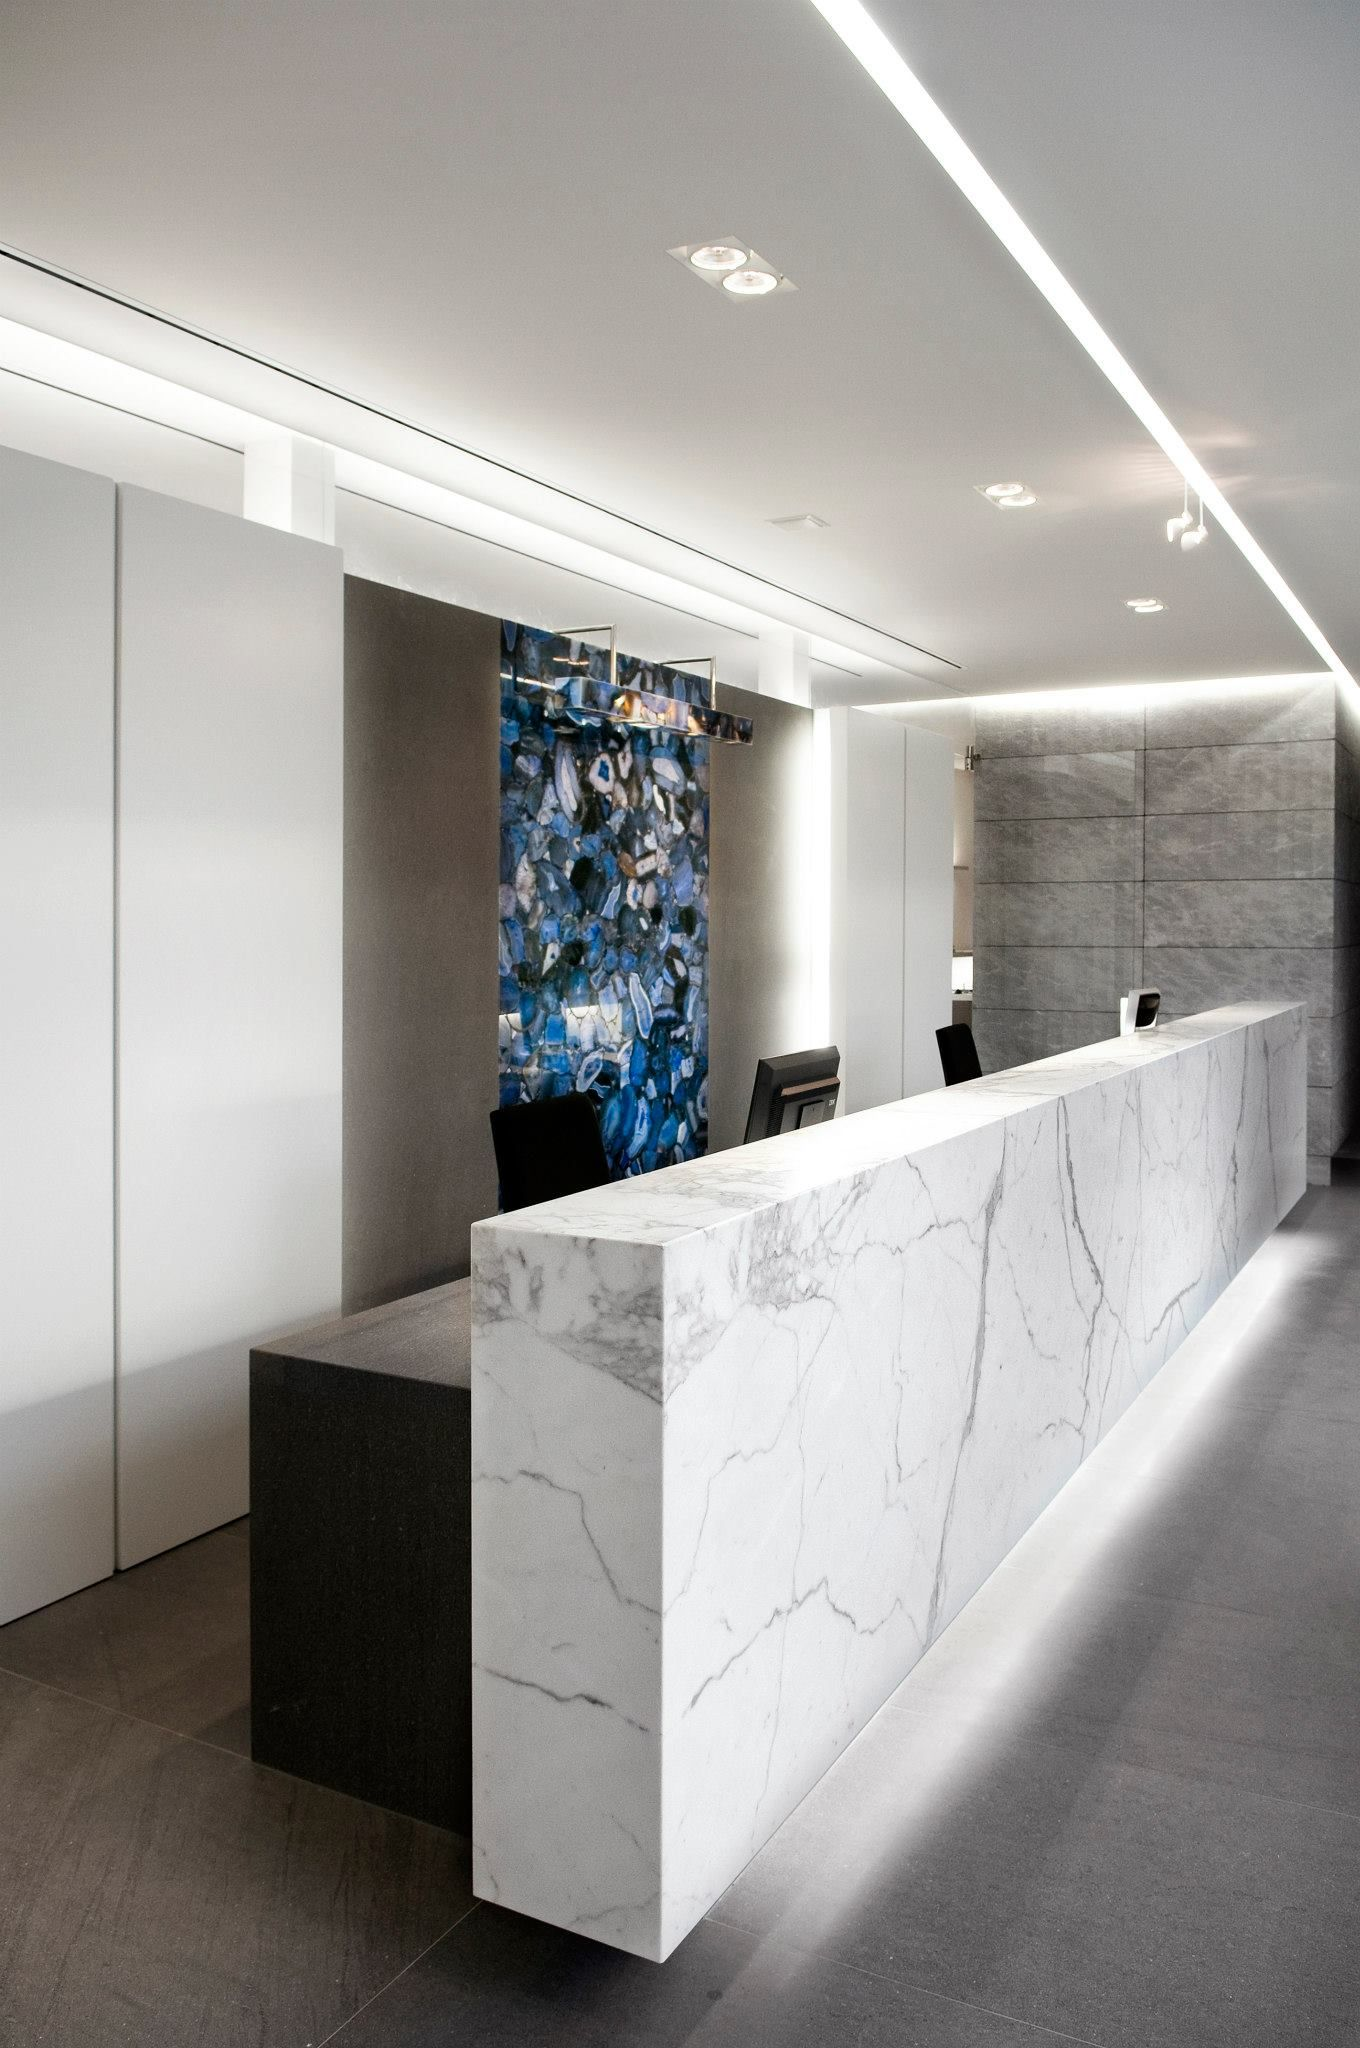 Zulte stone company buro interior recepciones for Mostradores para oficina